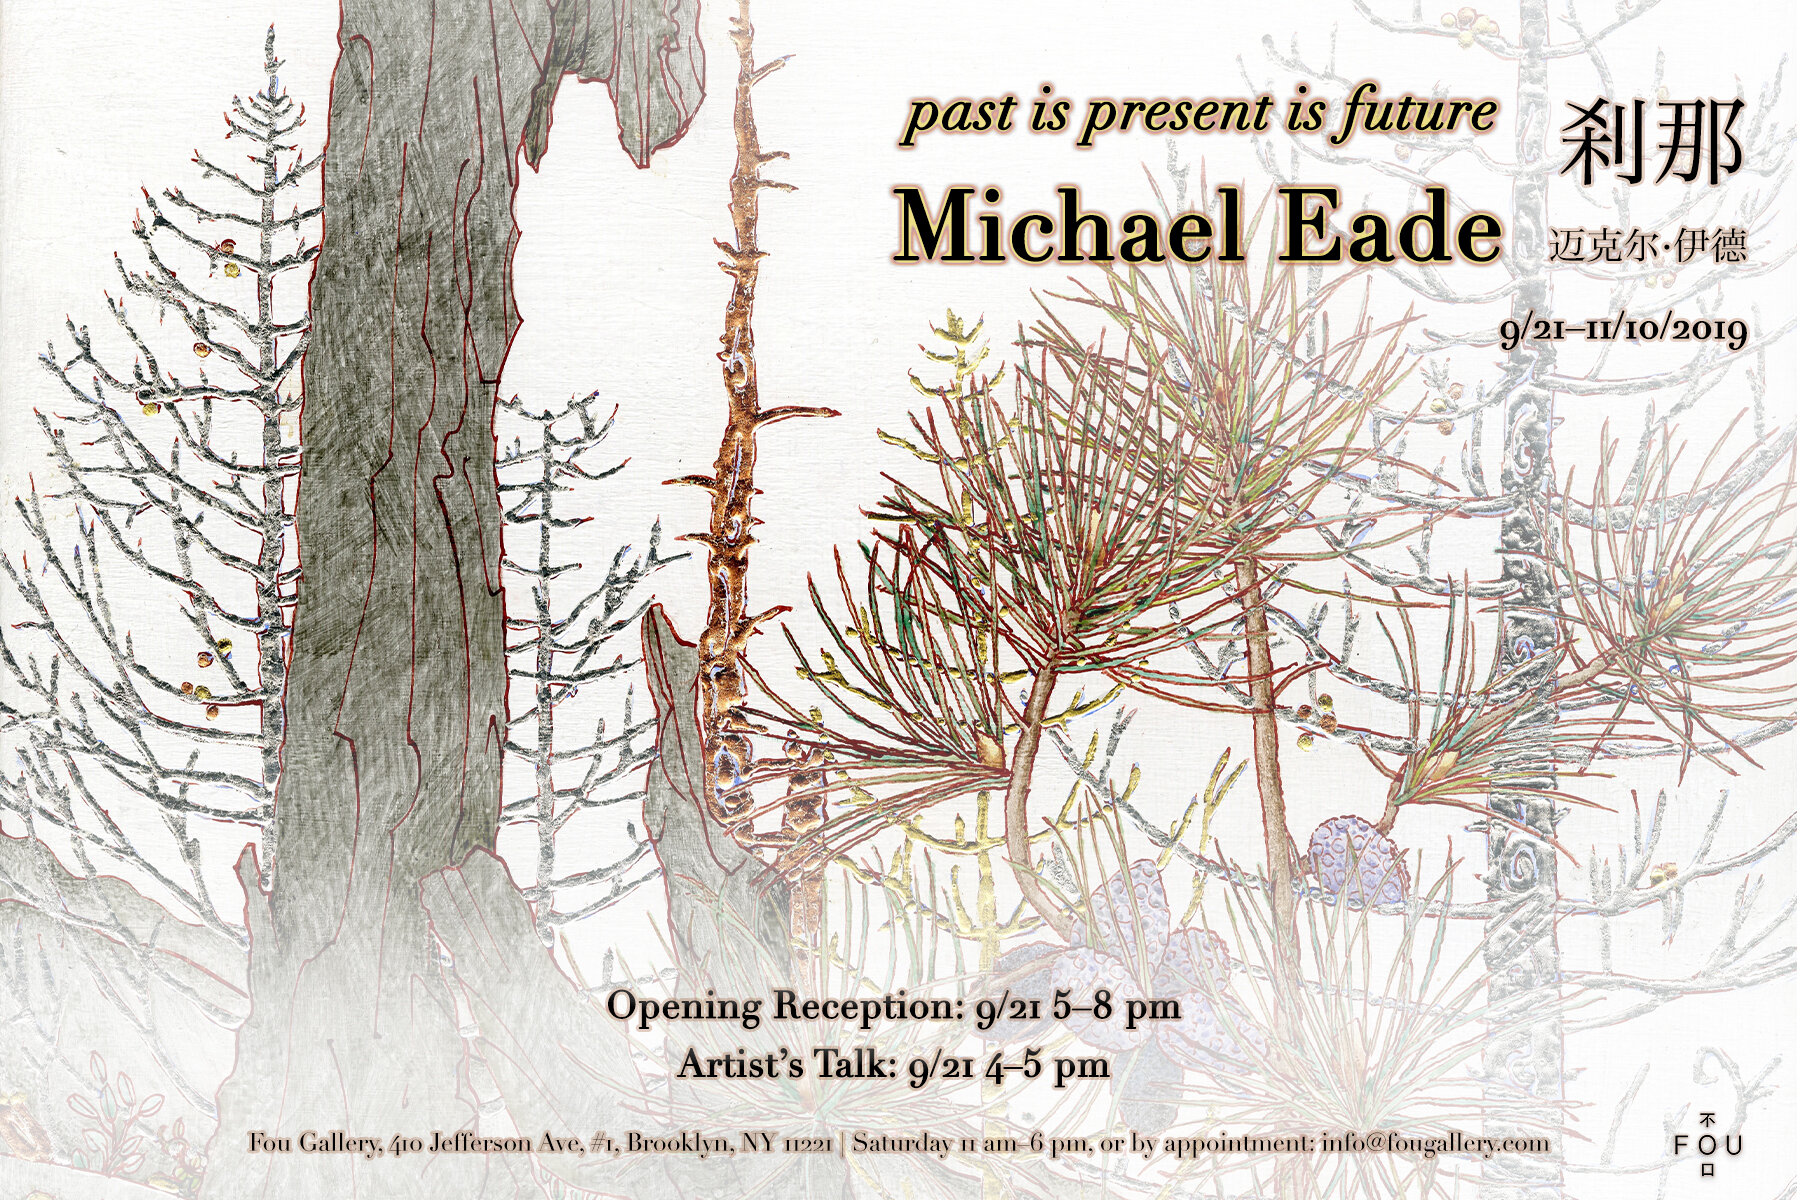 Michael Eade Poster_H.jpg